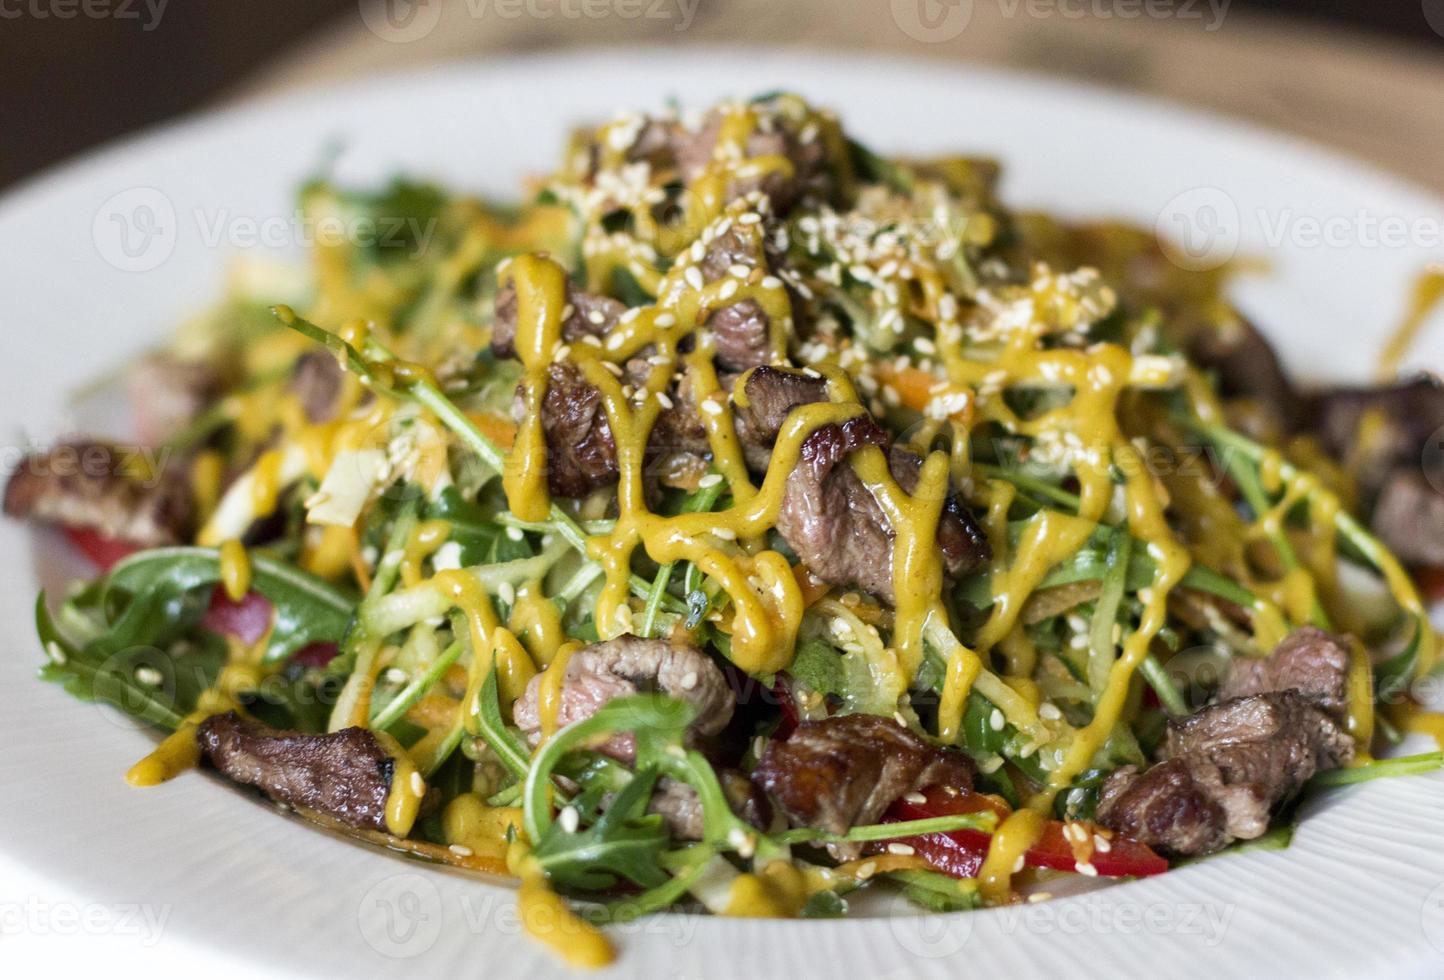 rundvlees salade. foto